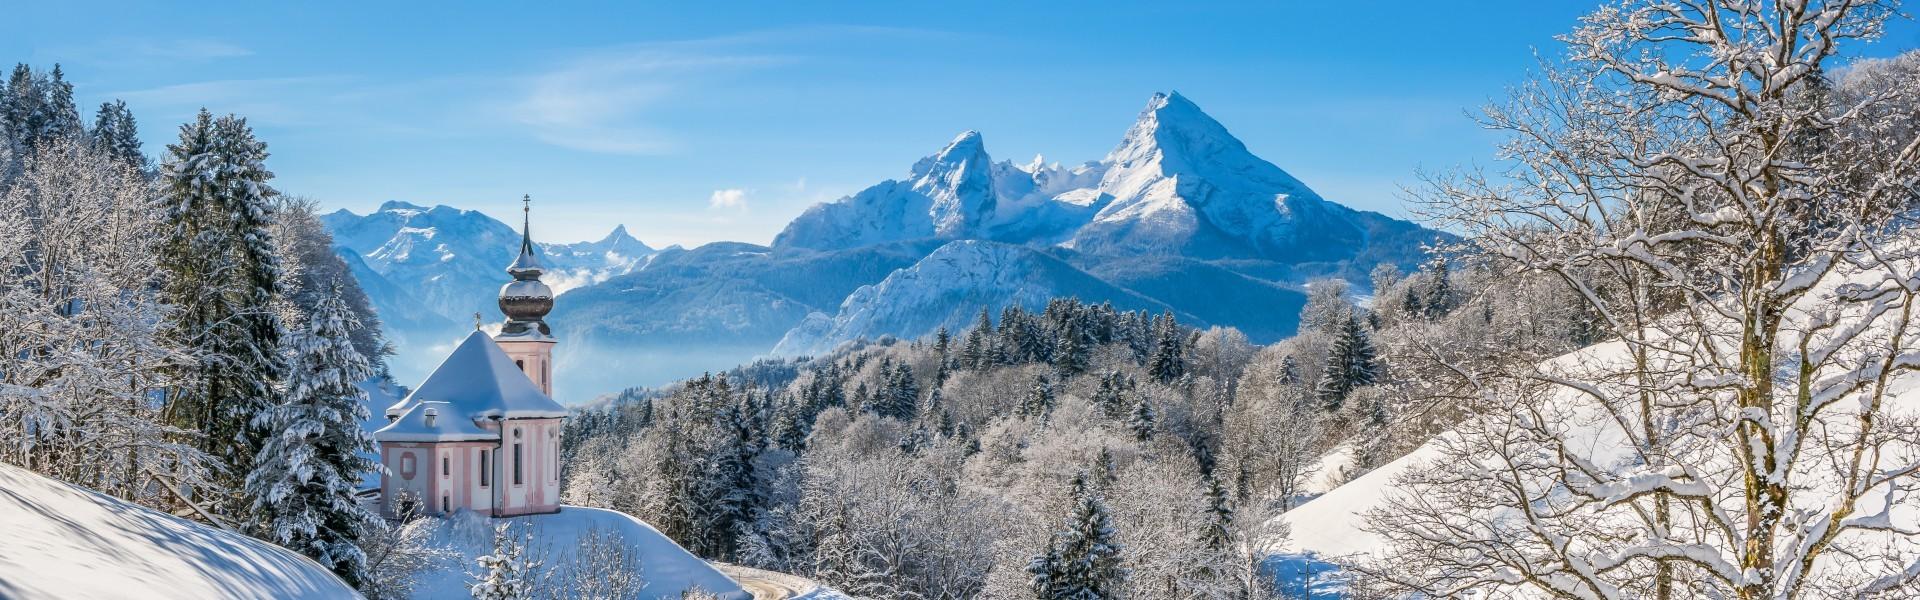 Urlaub im Hotel Bergheimat Berchtesgadener Land